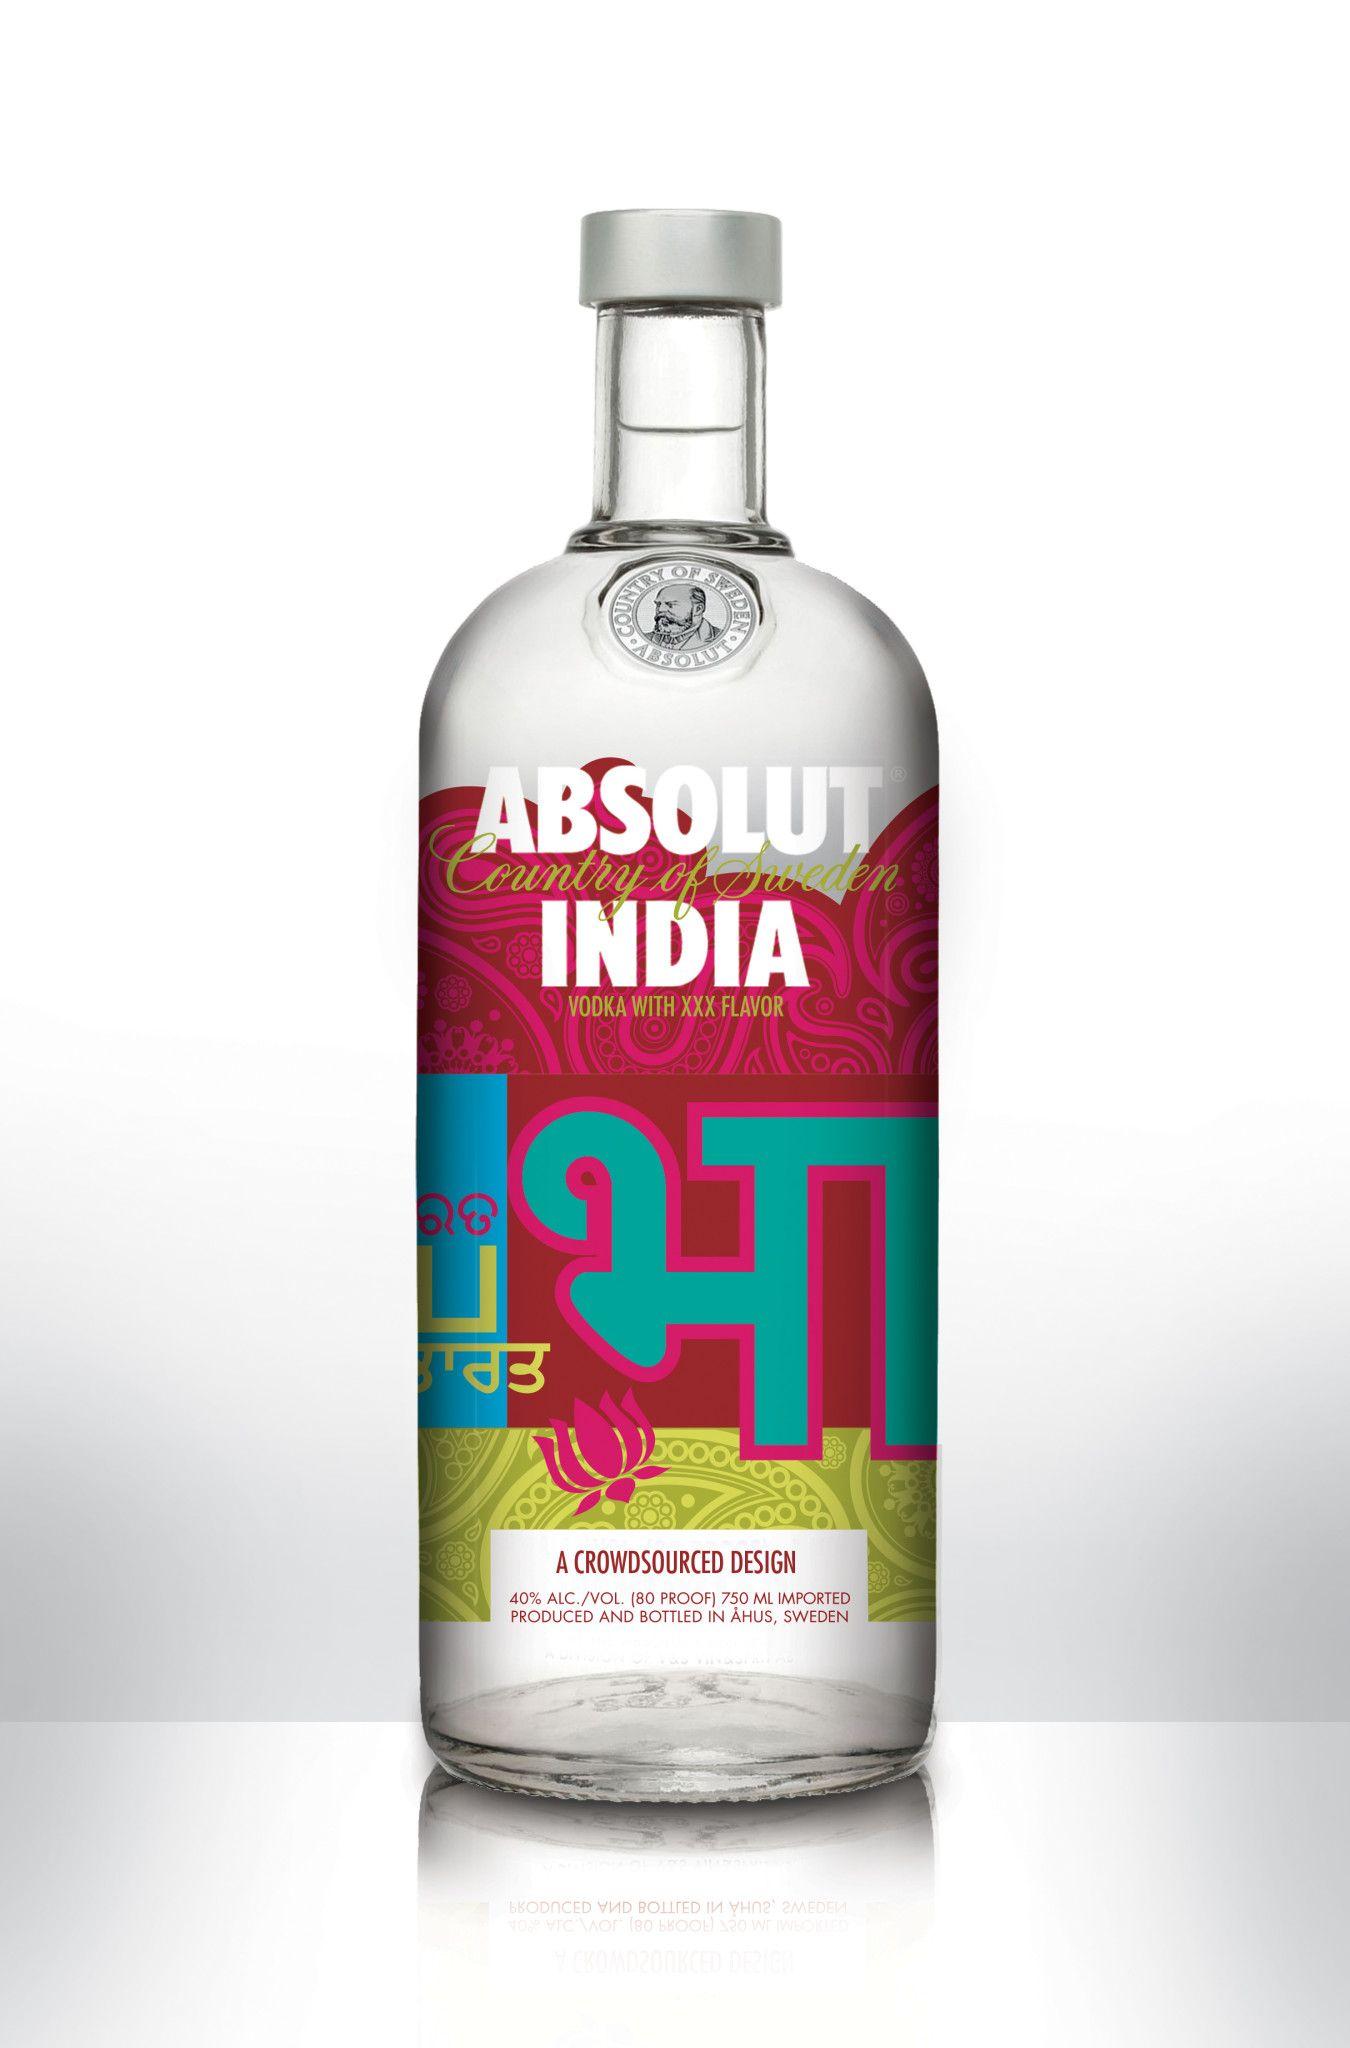 Hues Of India By Sanjaykumar Daramwar Drinks Design Bottles And Jars Absolut